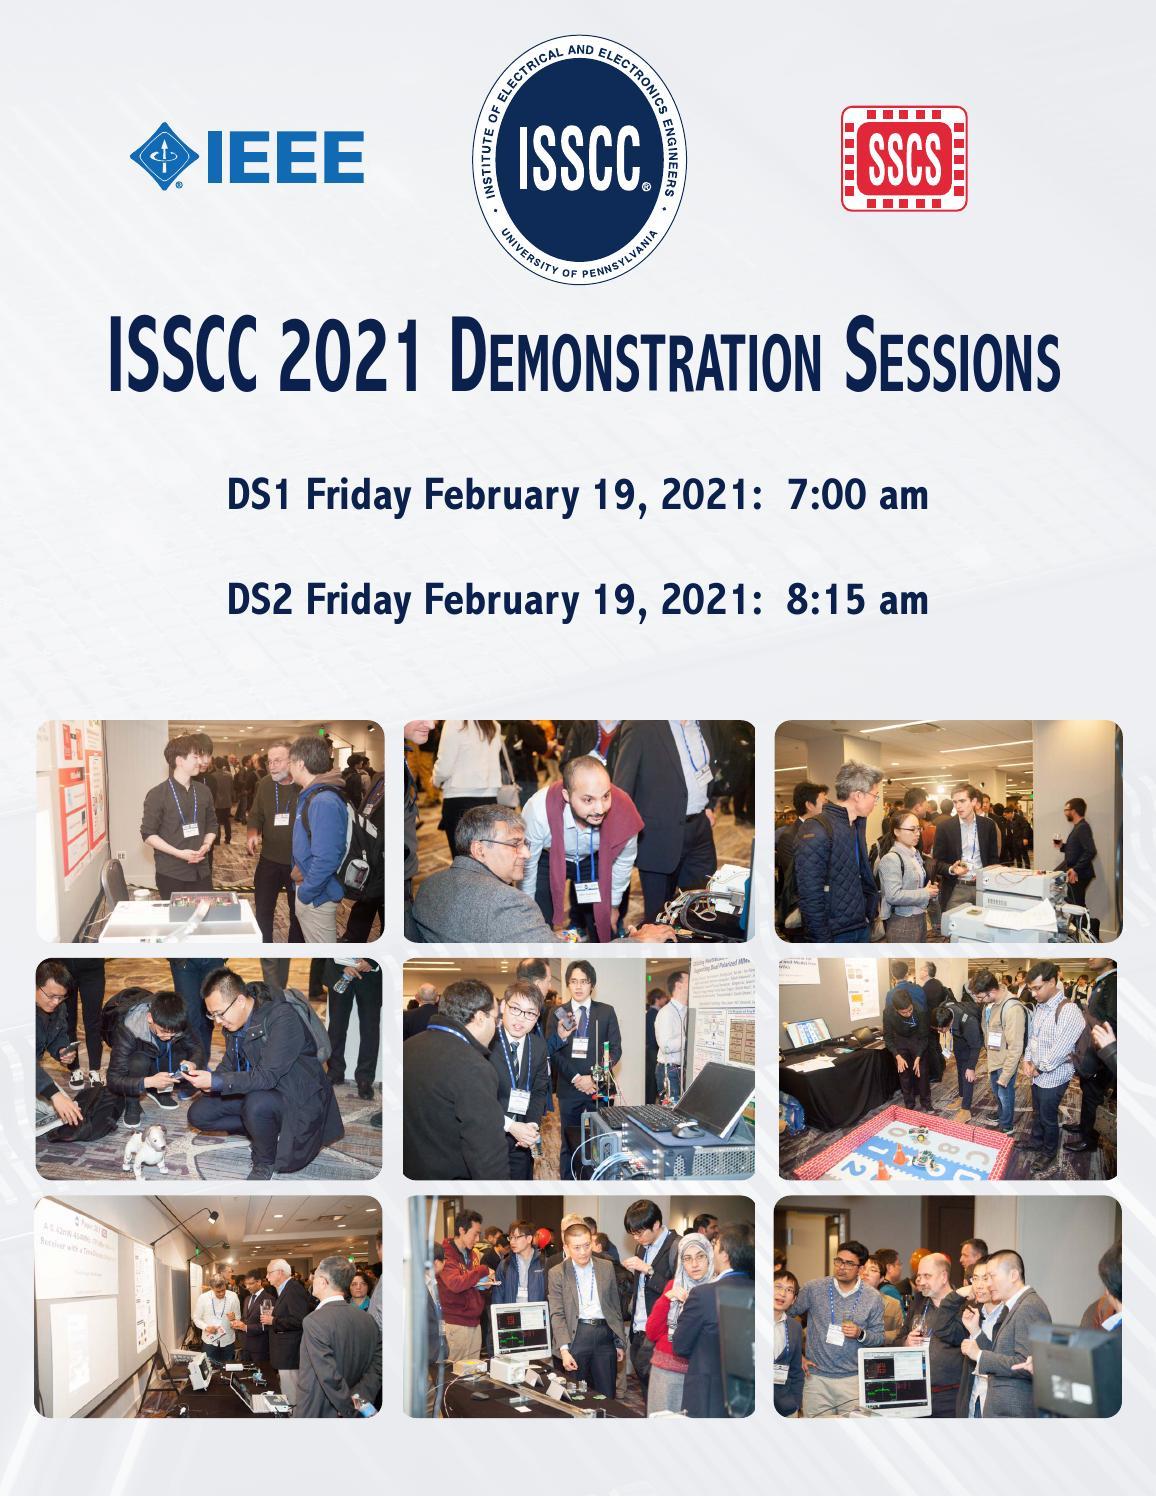 Isscc 2021 Demo Handout By Underlinescience Issuu